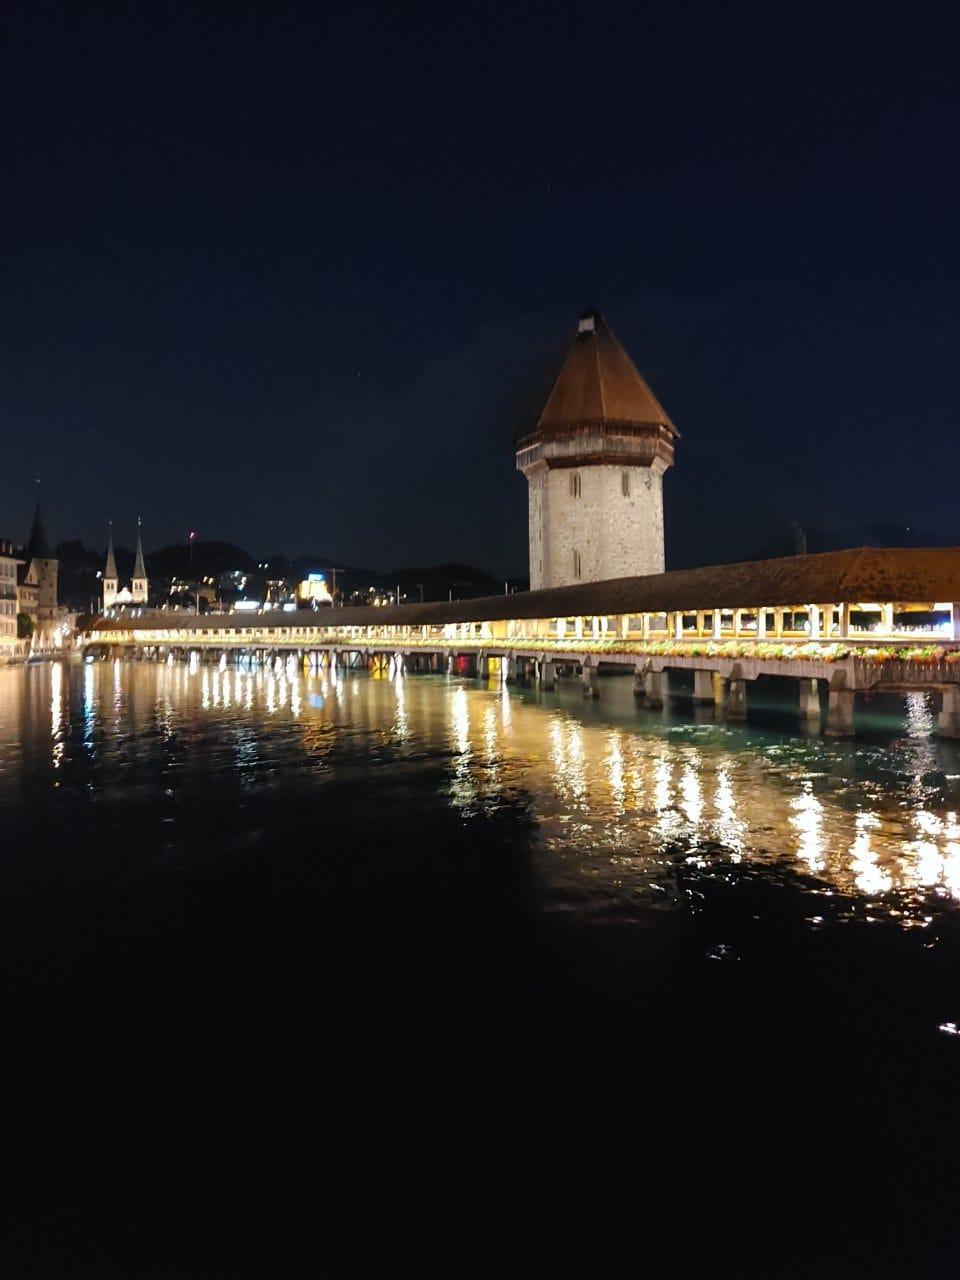 LG Vevlet Nachtaufnahme Kappelbrücke mit Nachtmodus